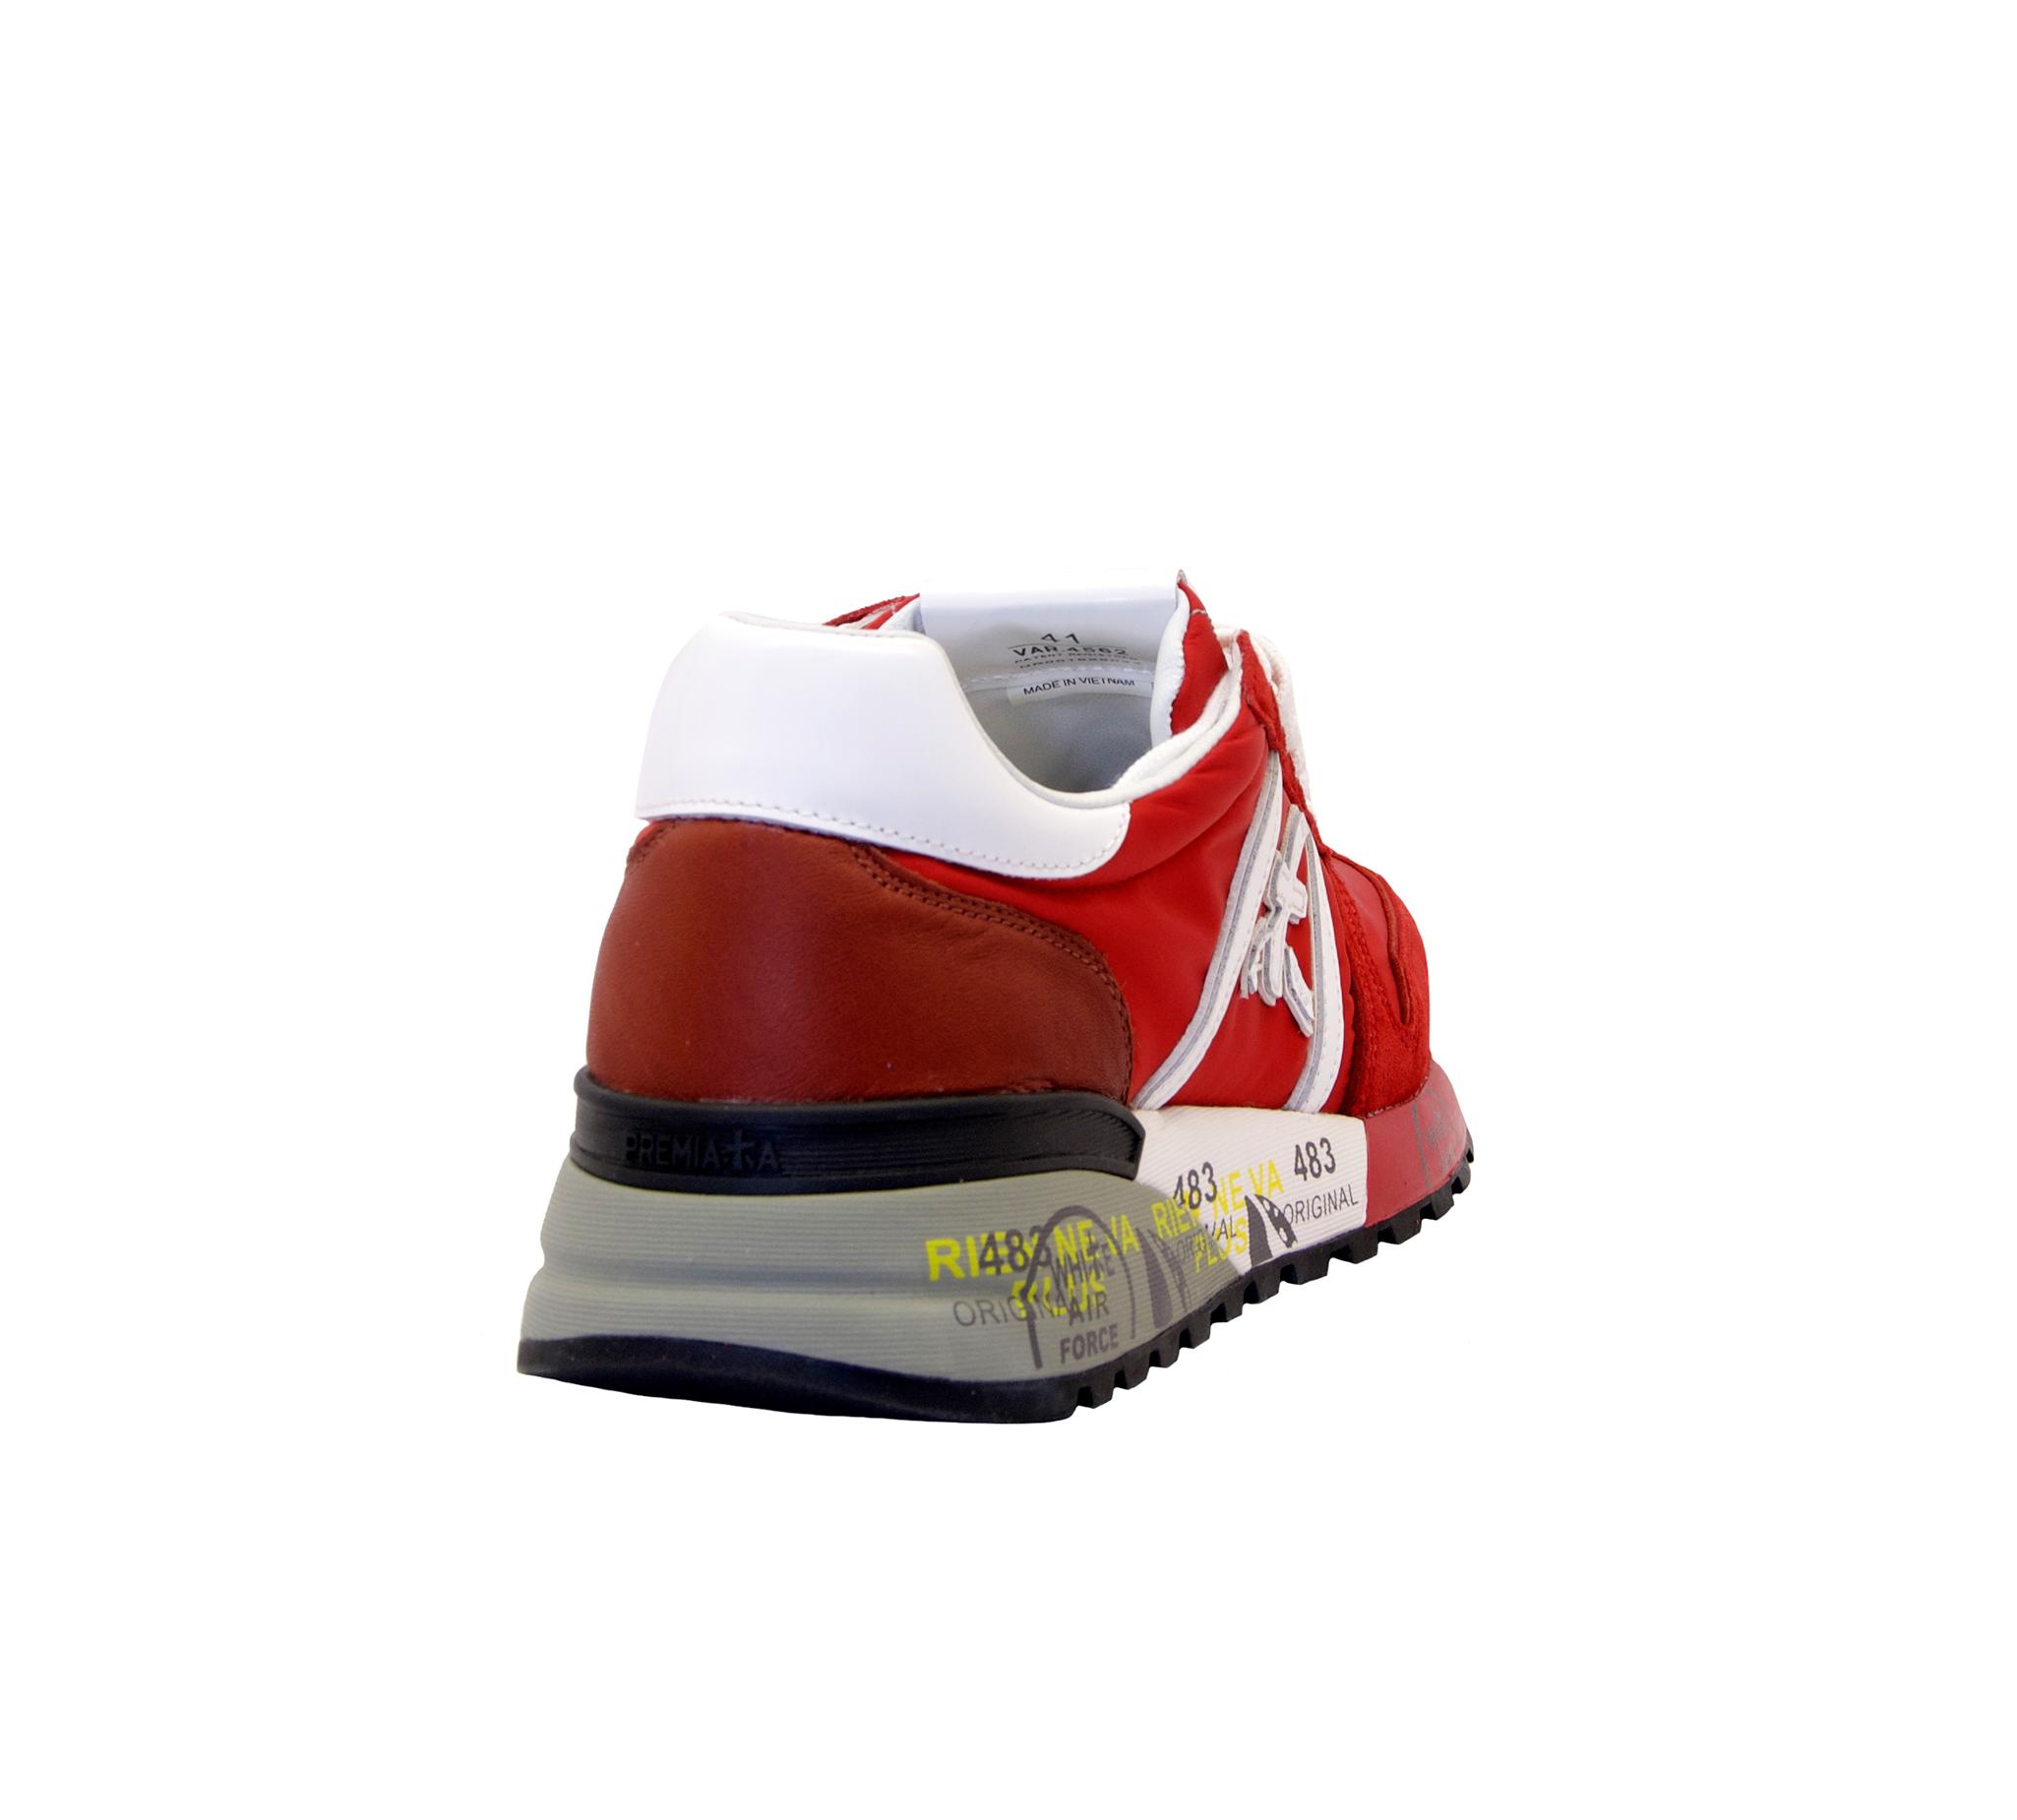 Sneakers Uomo PREMIATA Lander 4562 Camoscio Tessuto Rosso